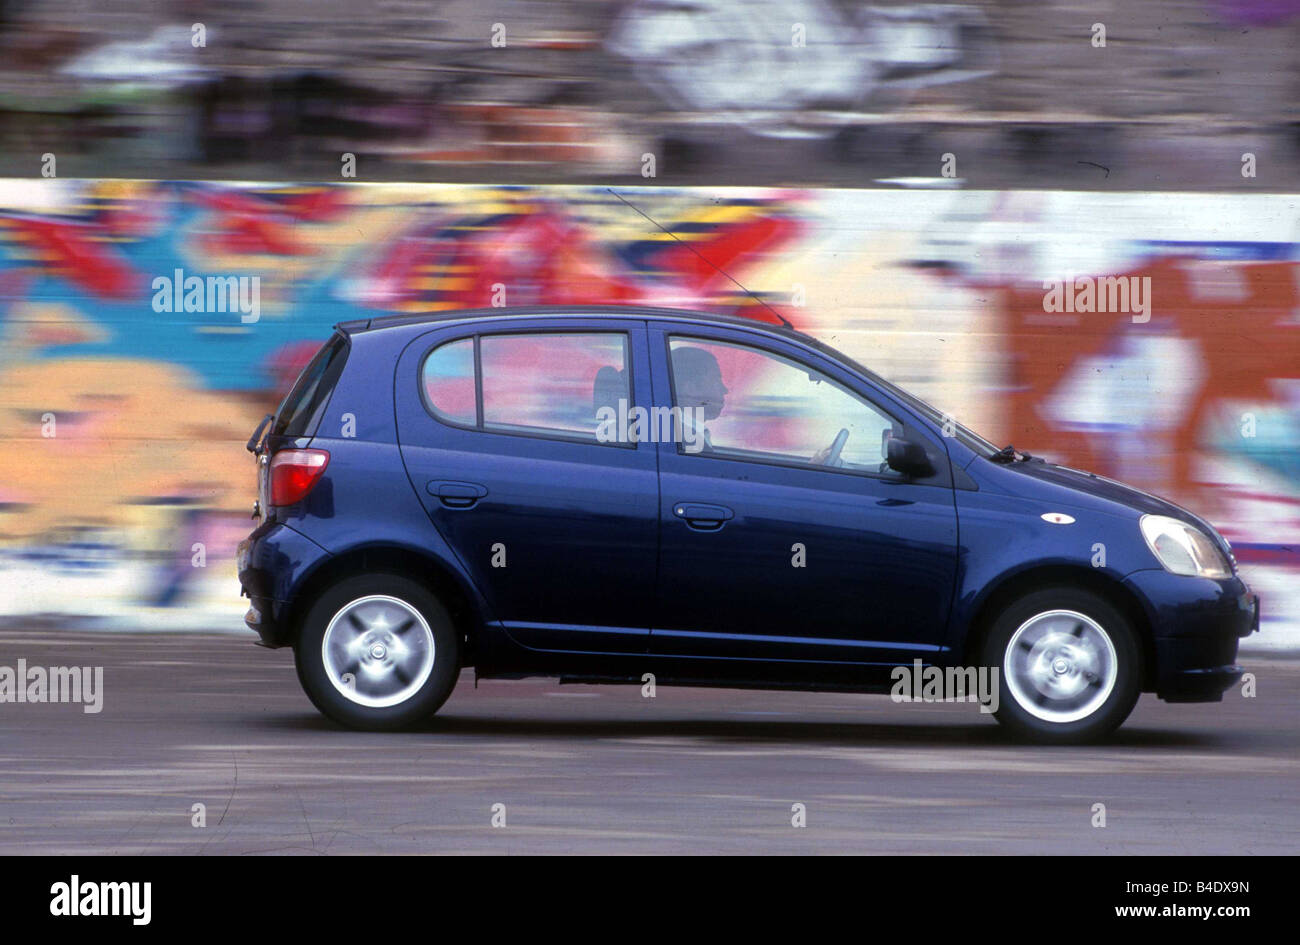 Kelebihan Toyota Yaris 1999 Tangguh